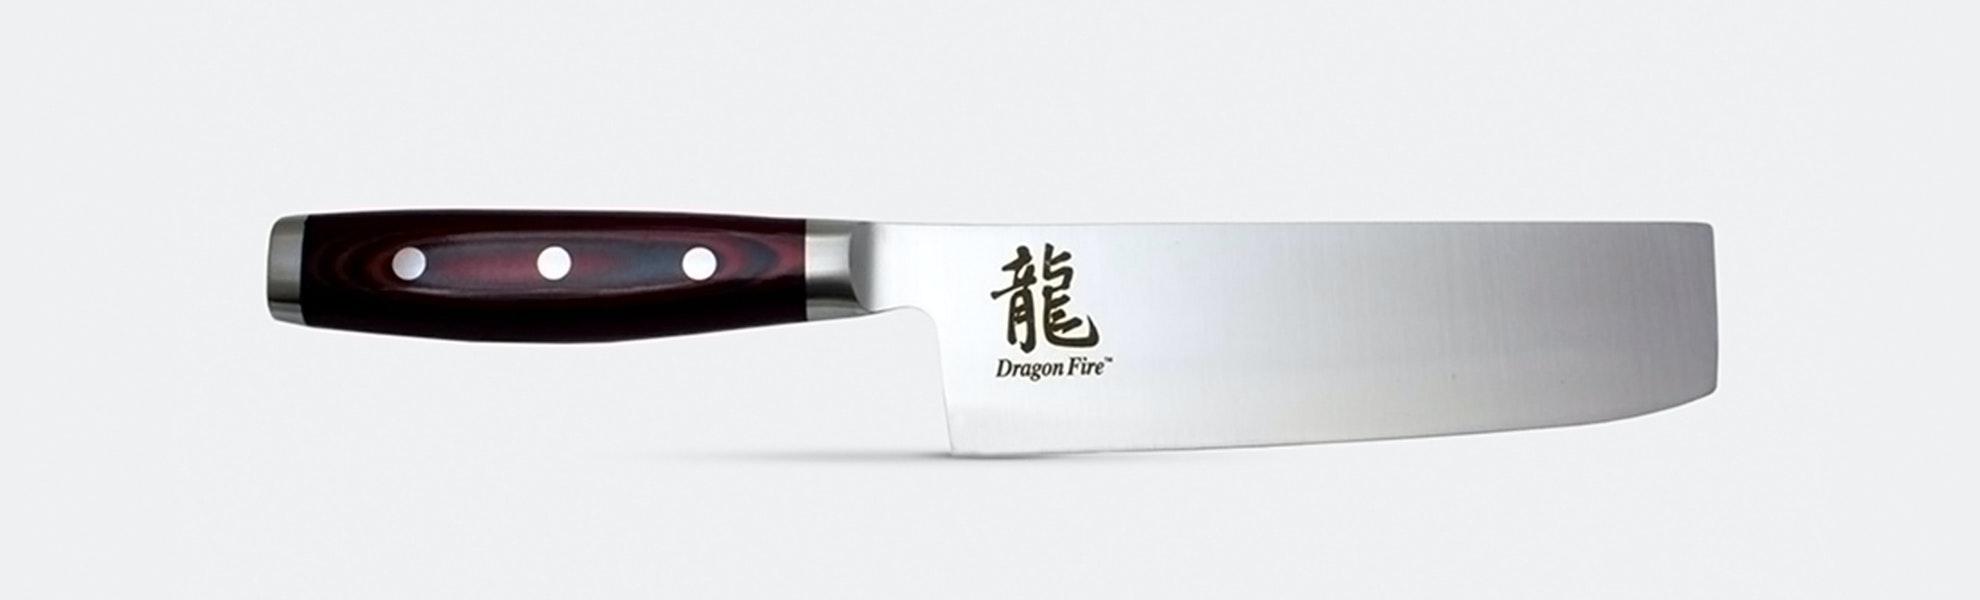 "Apogee Culinary Dragon Fire BD1N 7"" Nakiri Knife"